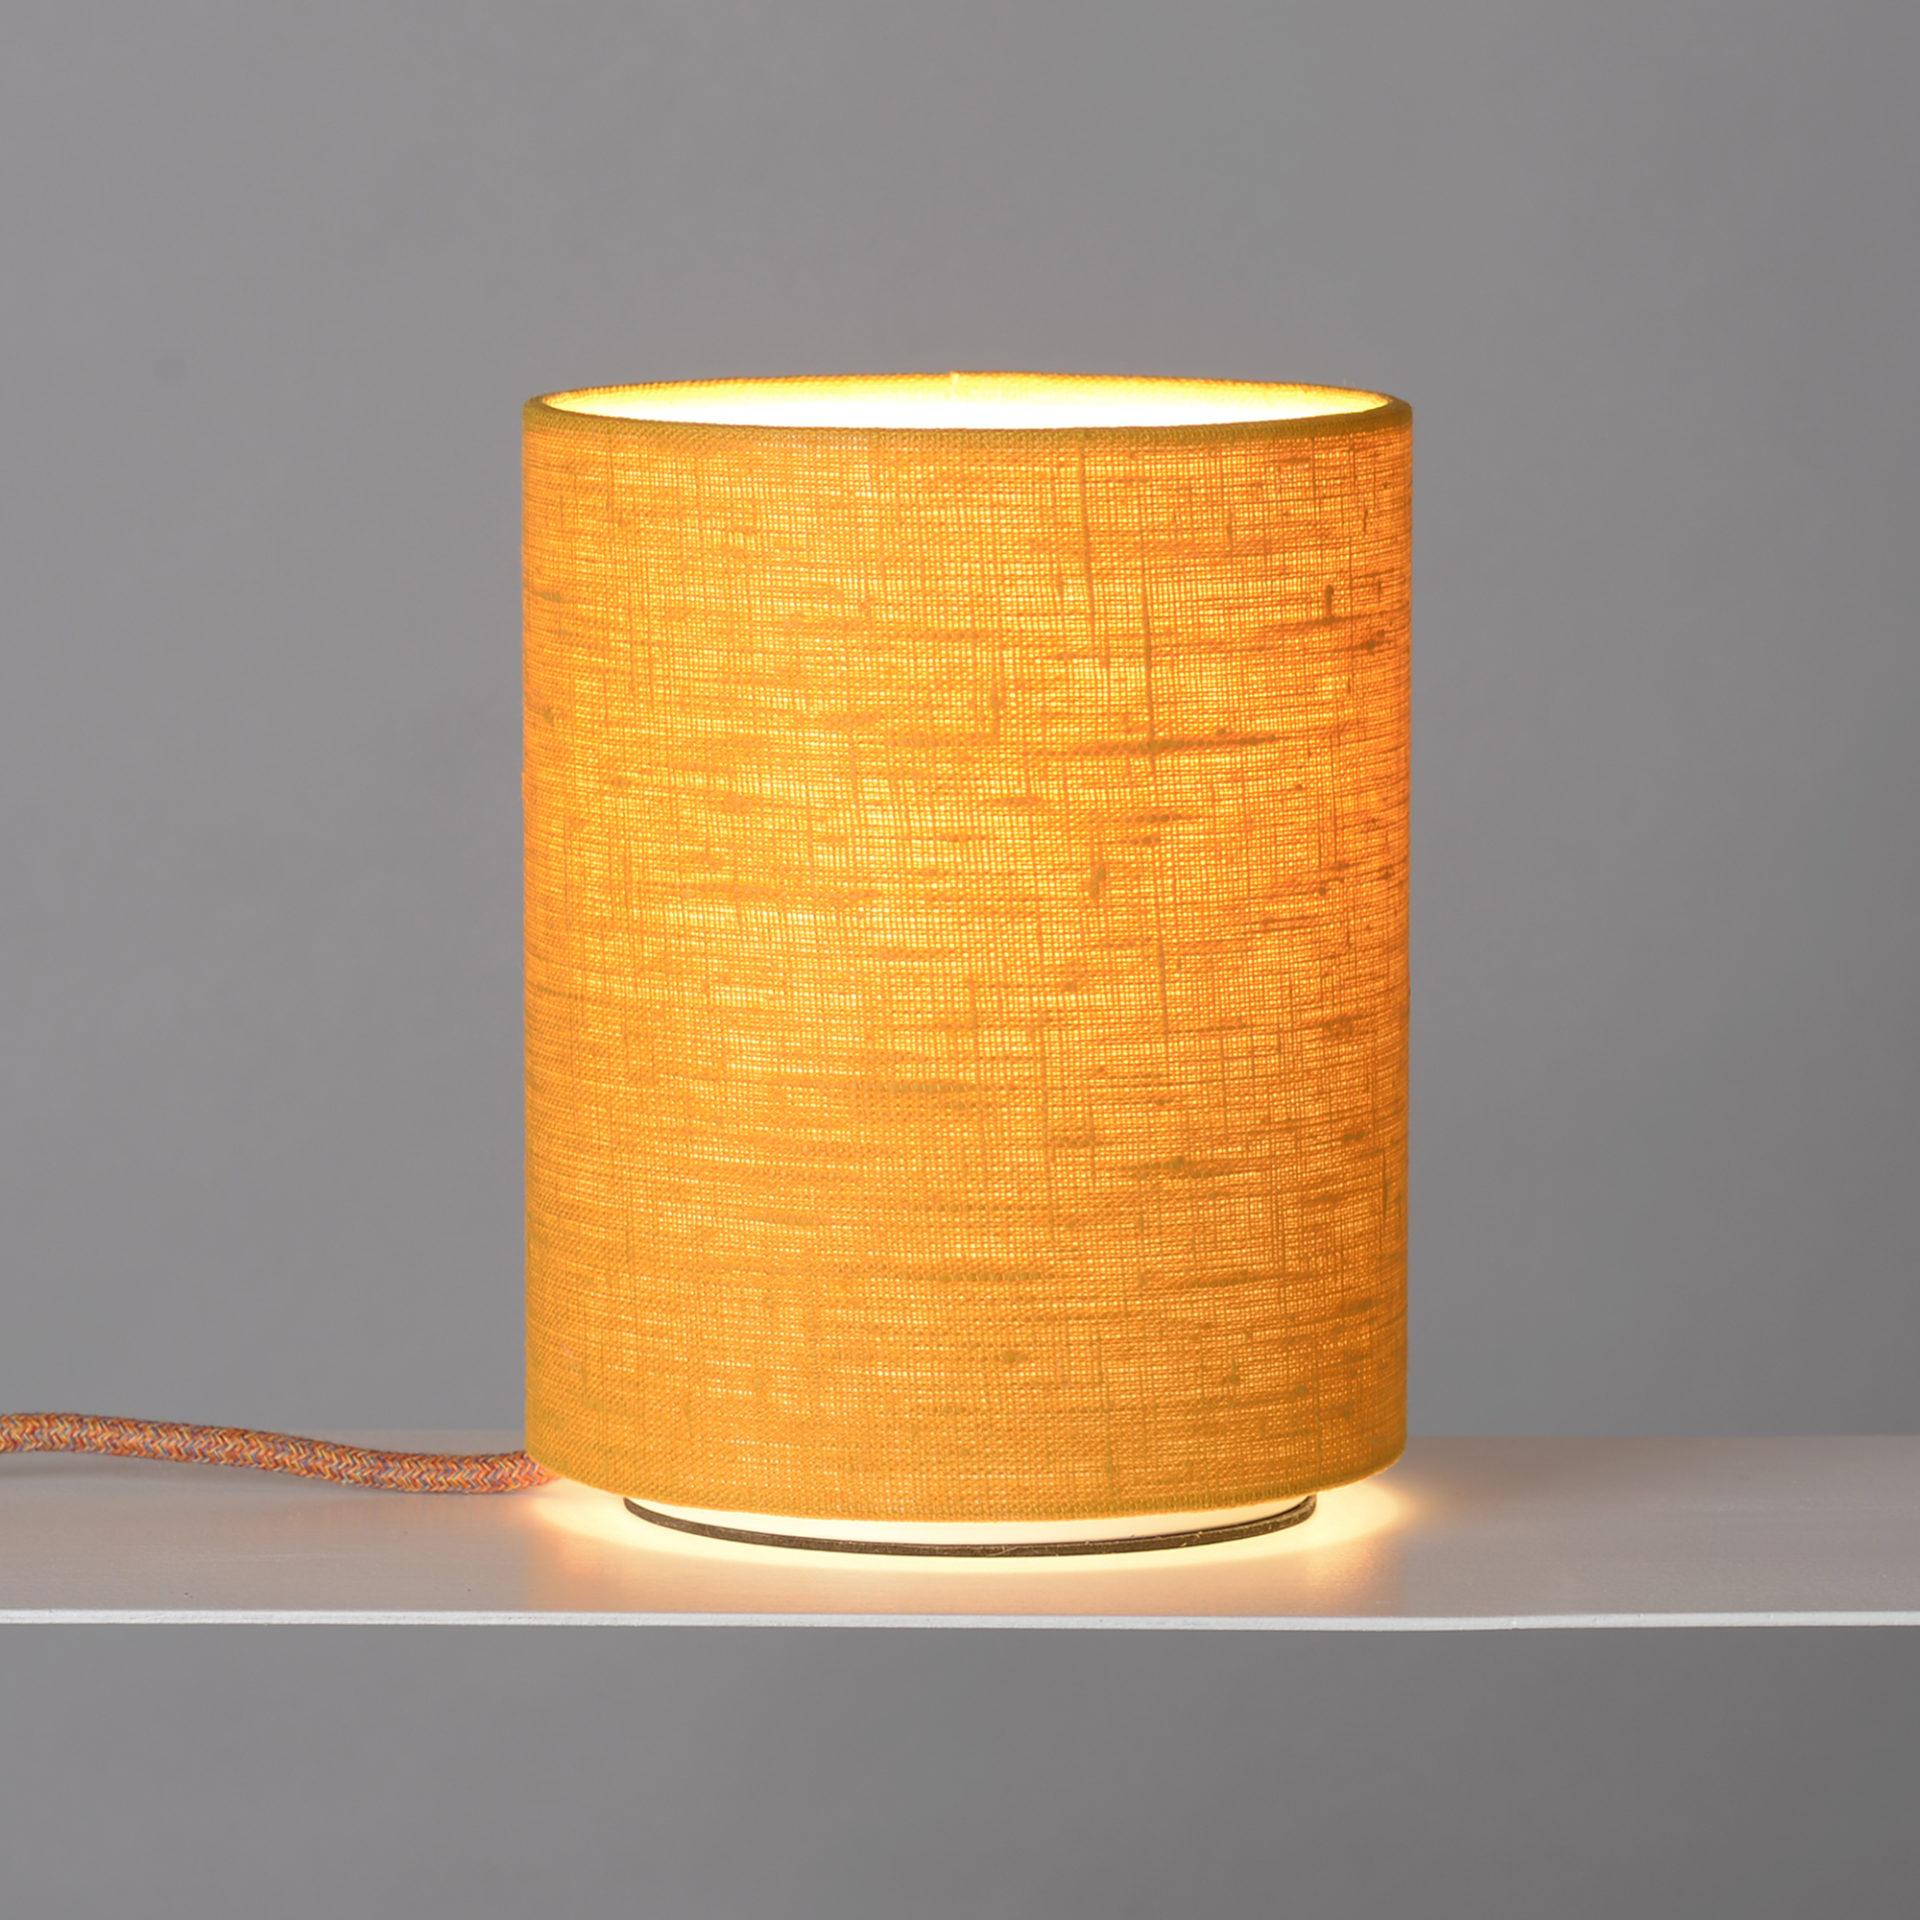 Tischlampe illuminating yellow